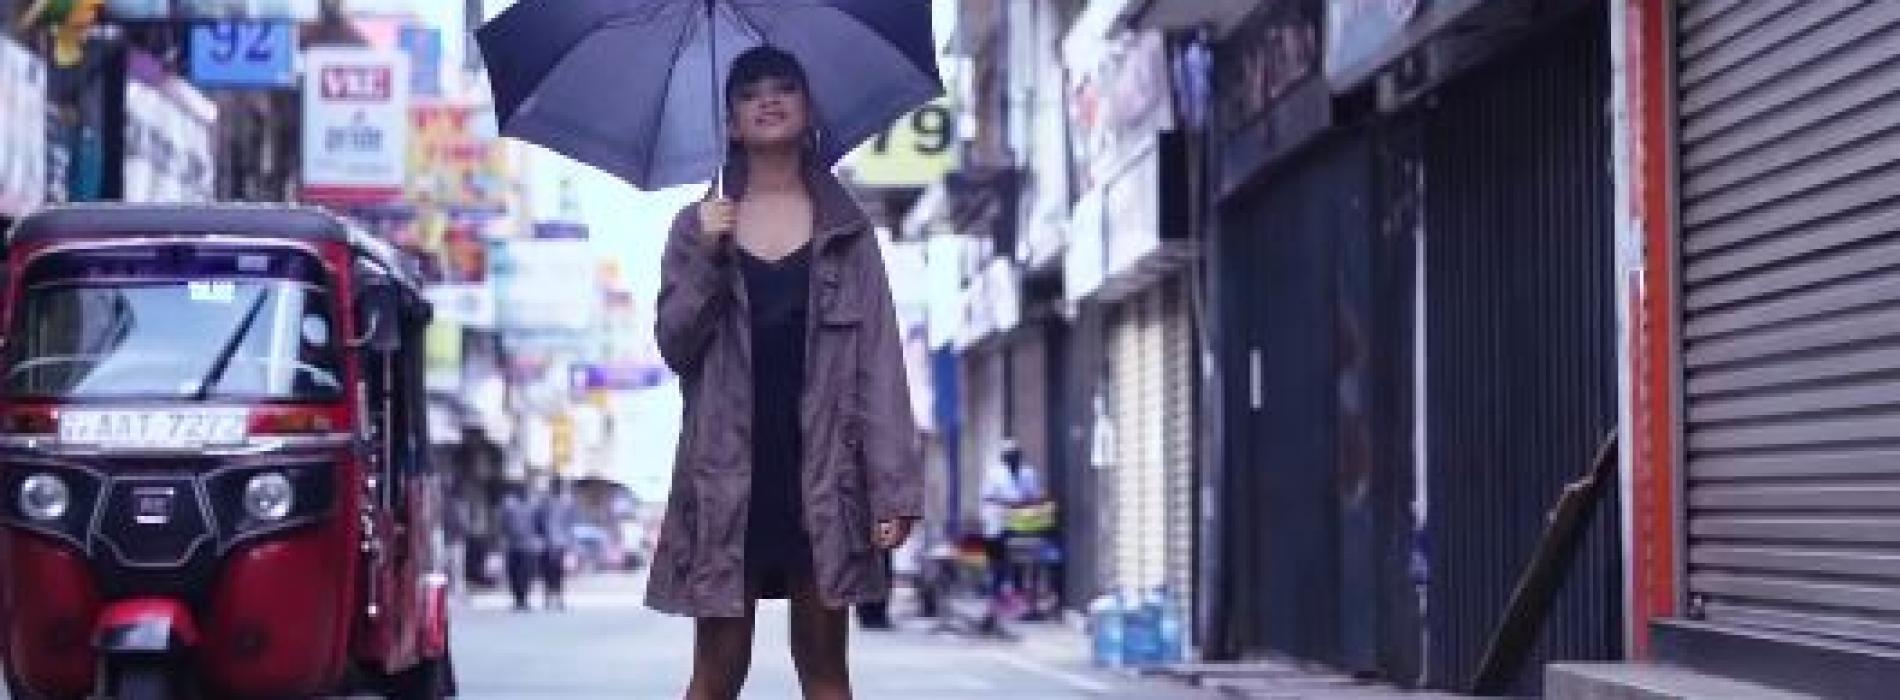 New Music : Hana Shafa – Sinhala Mashup Cover Official Music Video